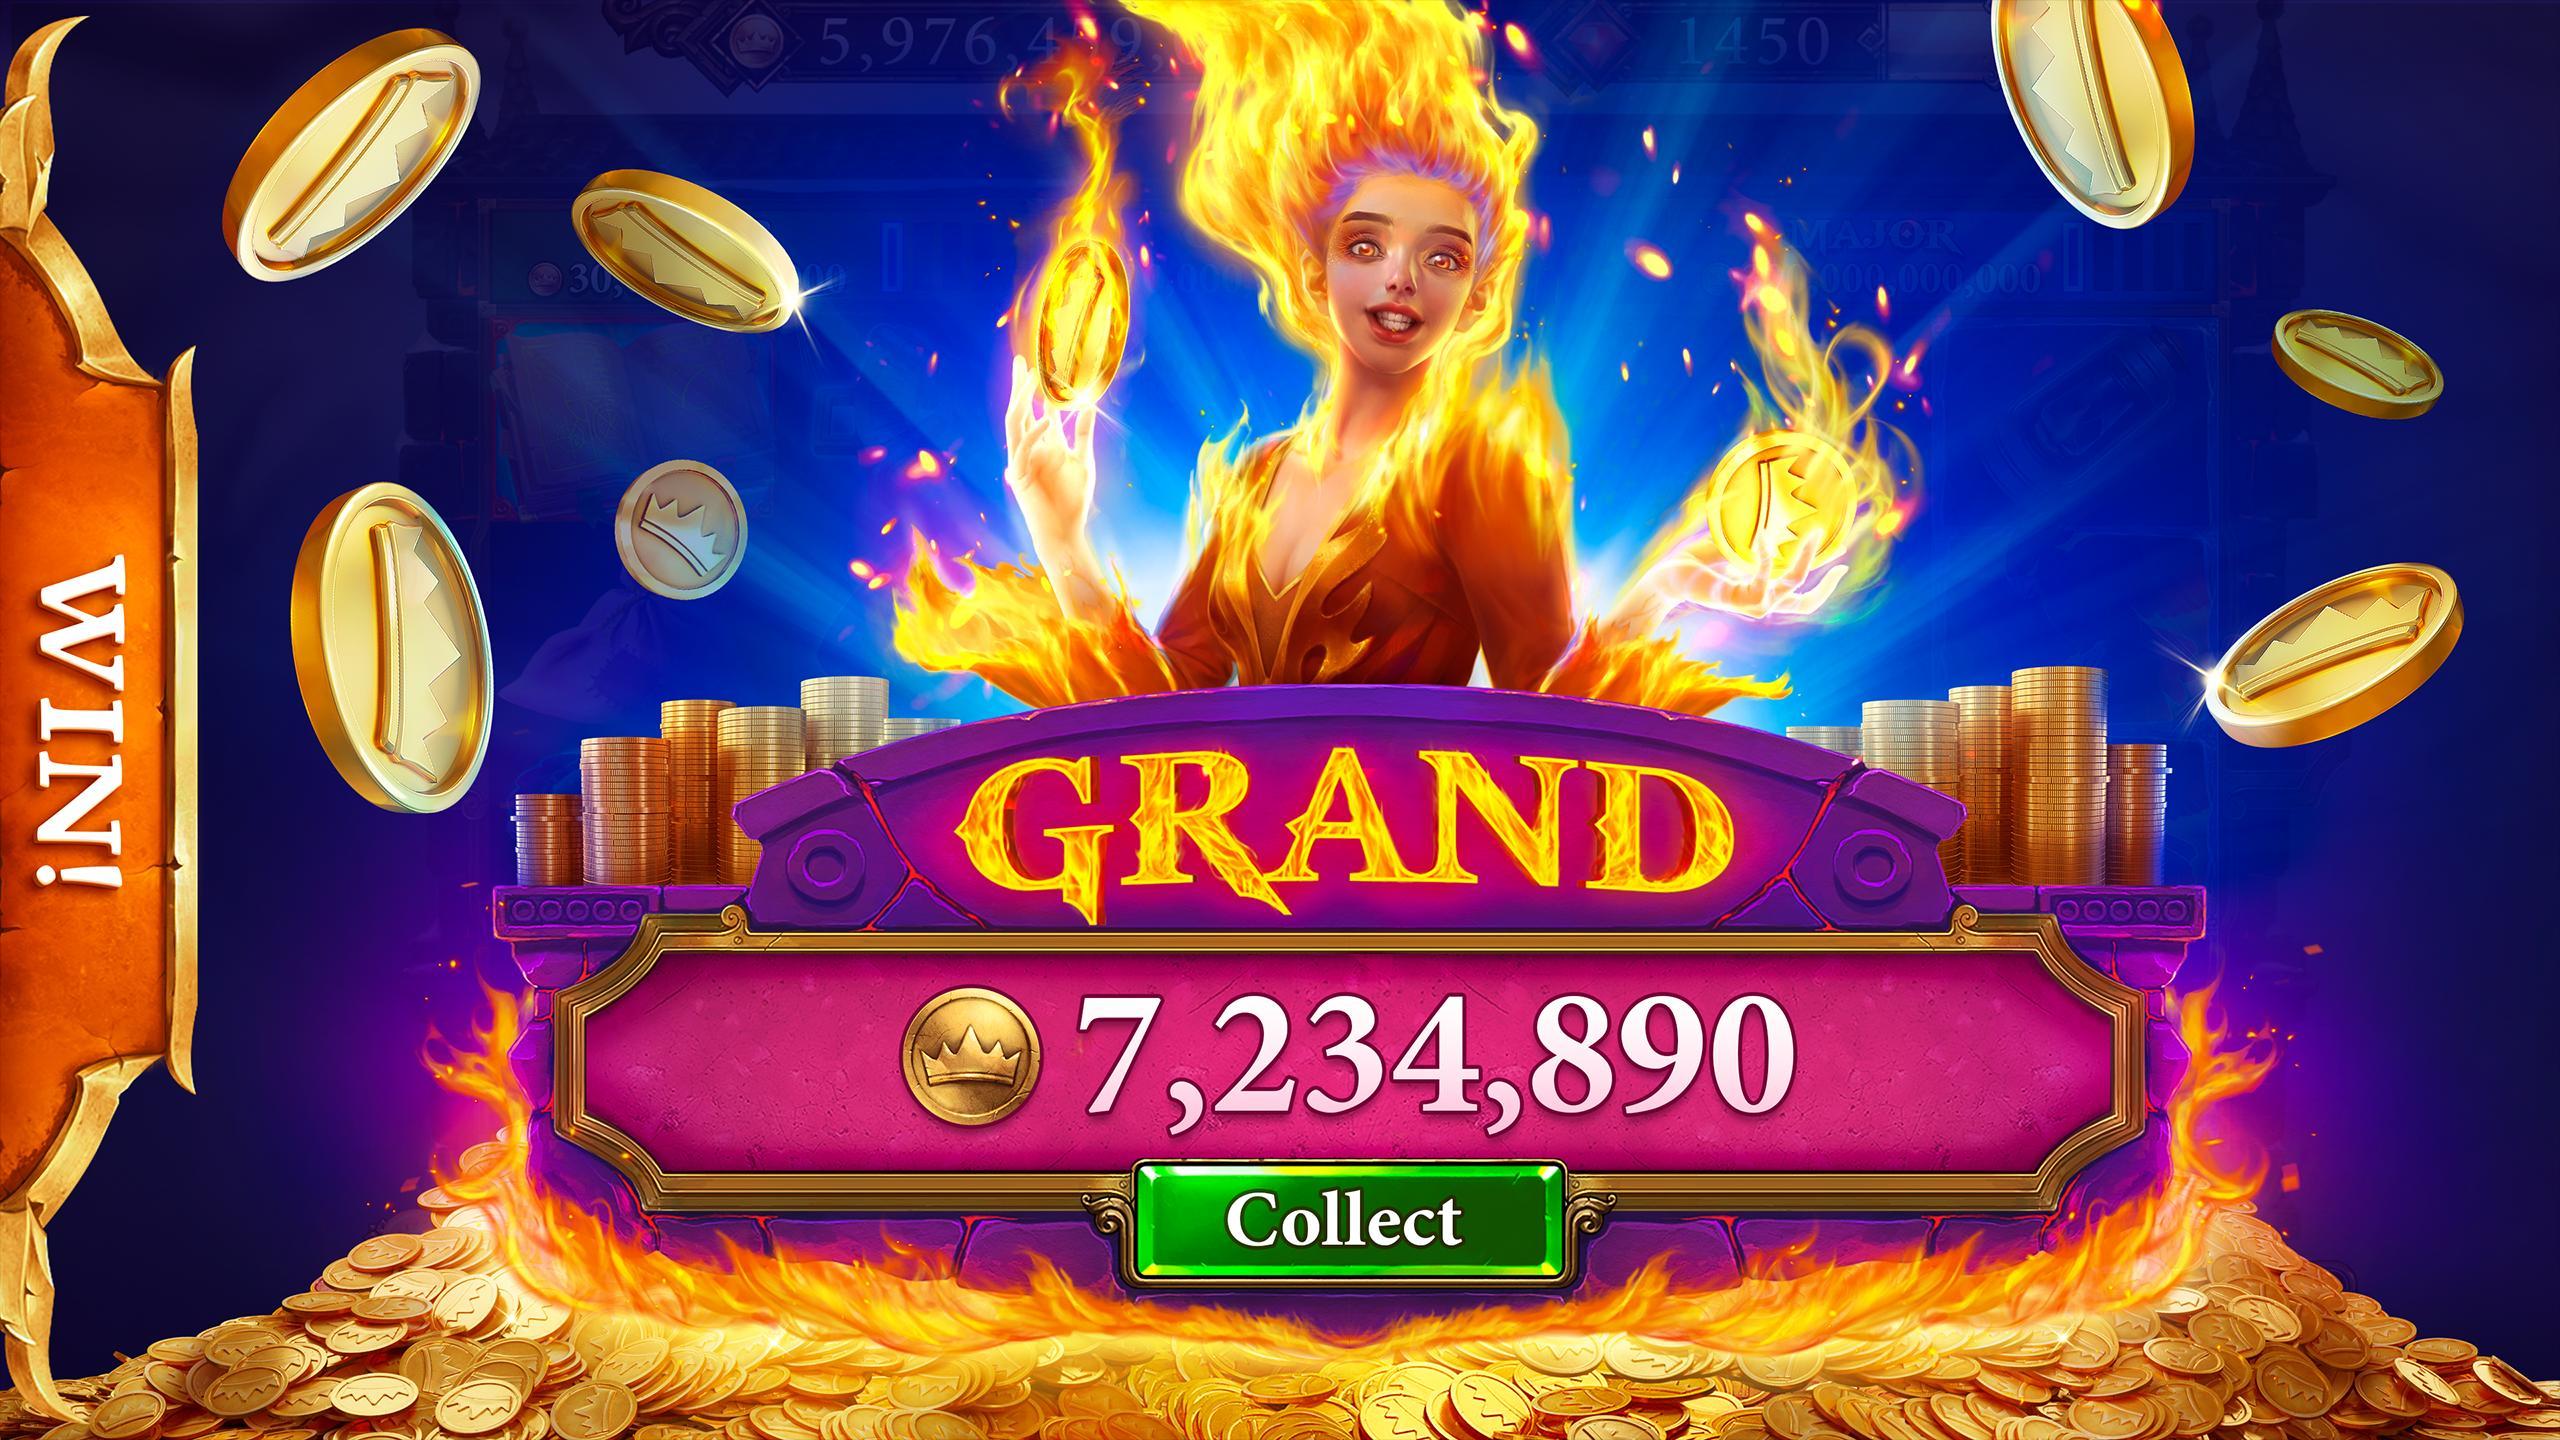 Scatter Slots Las Vegas Casino Game 777 Online 3.87.0 Screenshot 7